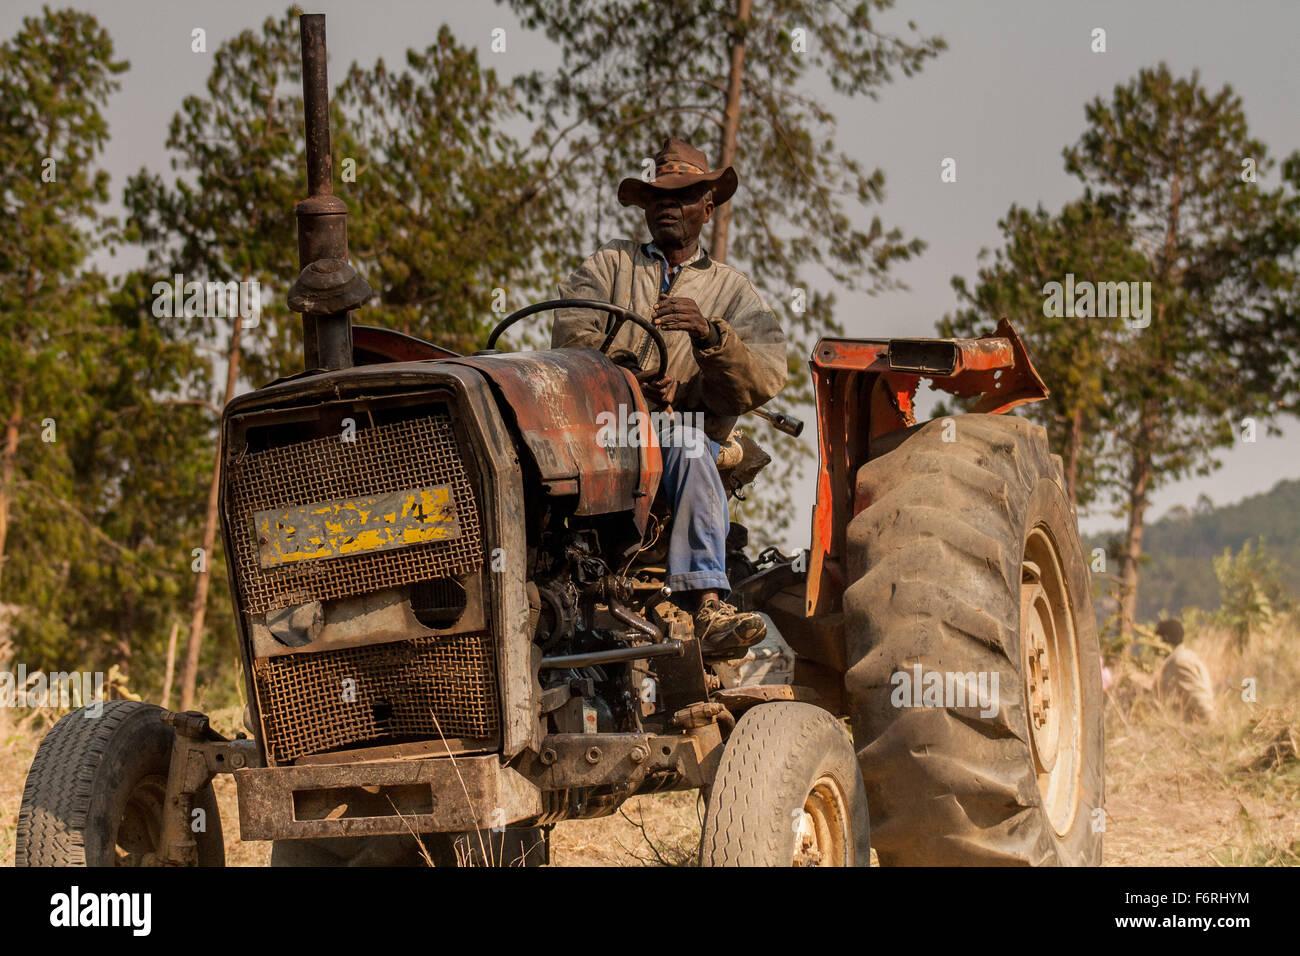 Massey Ferguson Tractor Stock Photos & Massey Ferguson